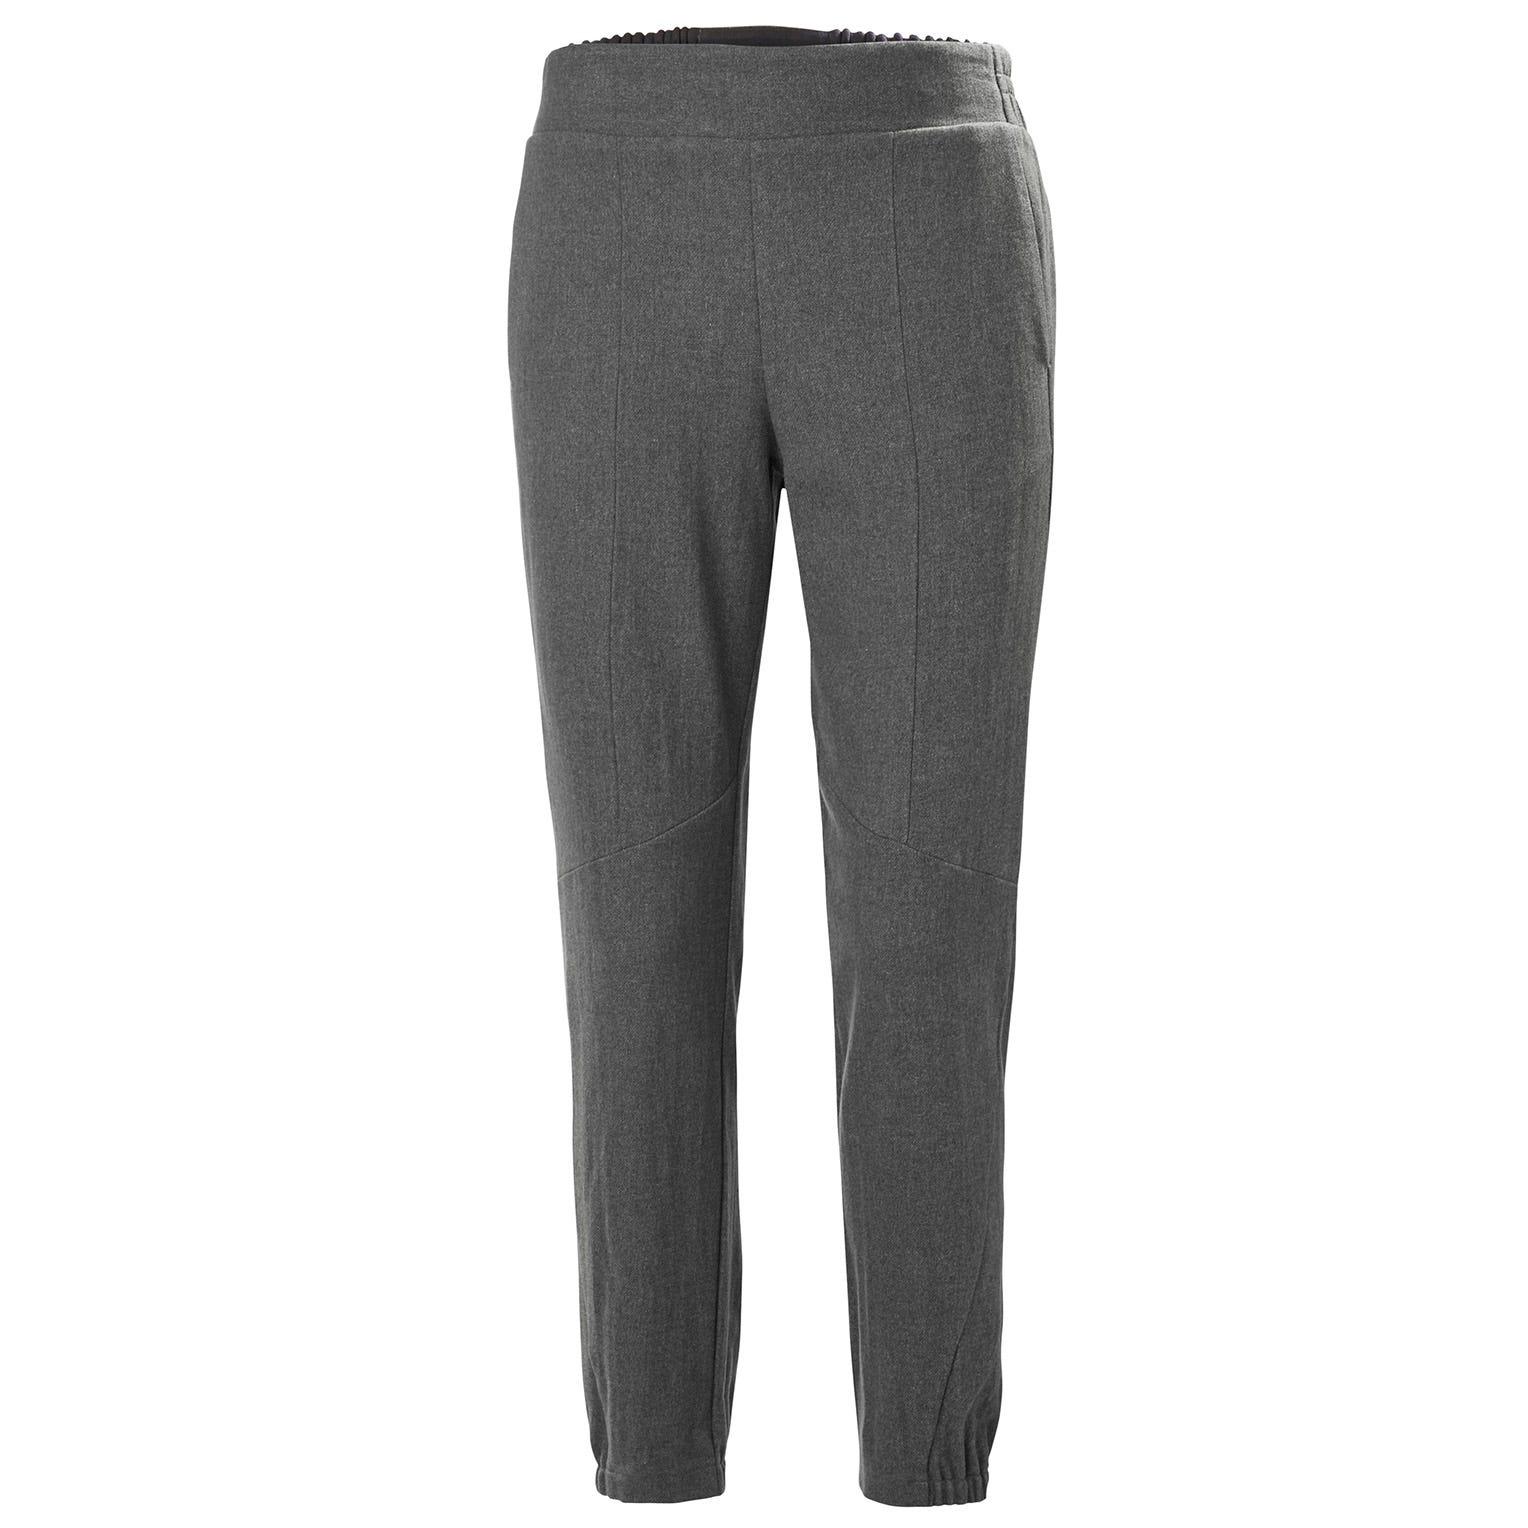 Helly Hansen W Wool Travel Pant Womens Hiking Grey XL